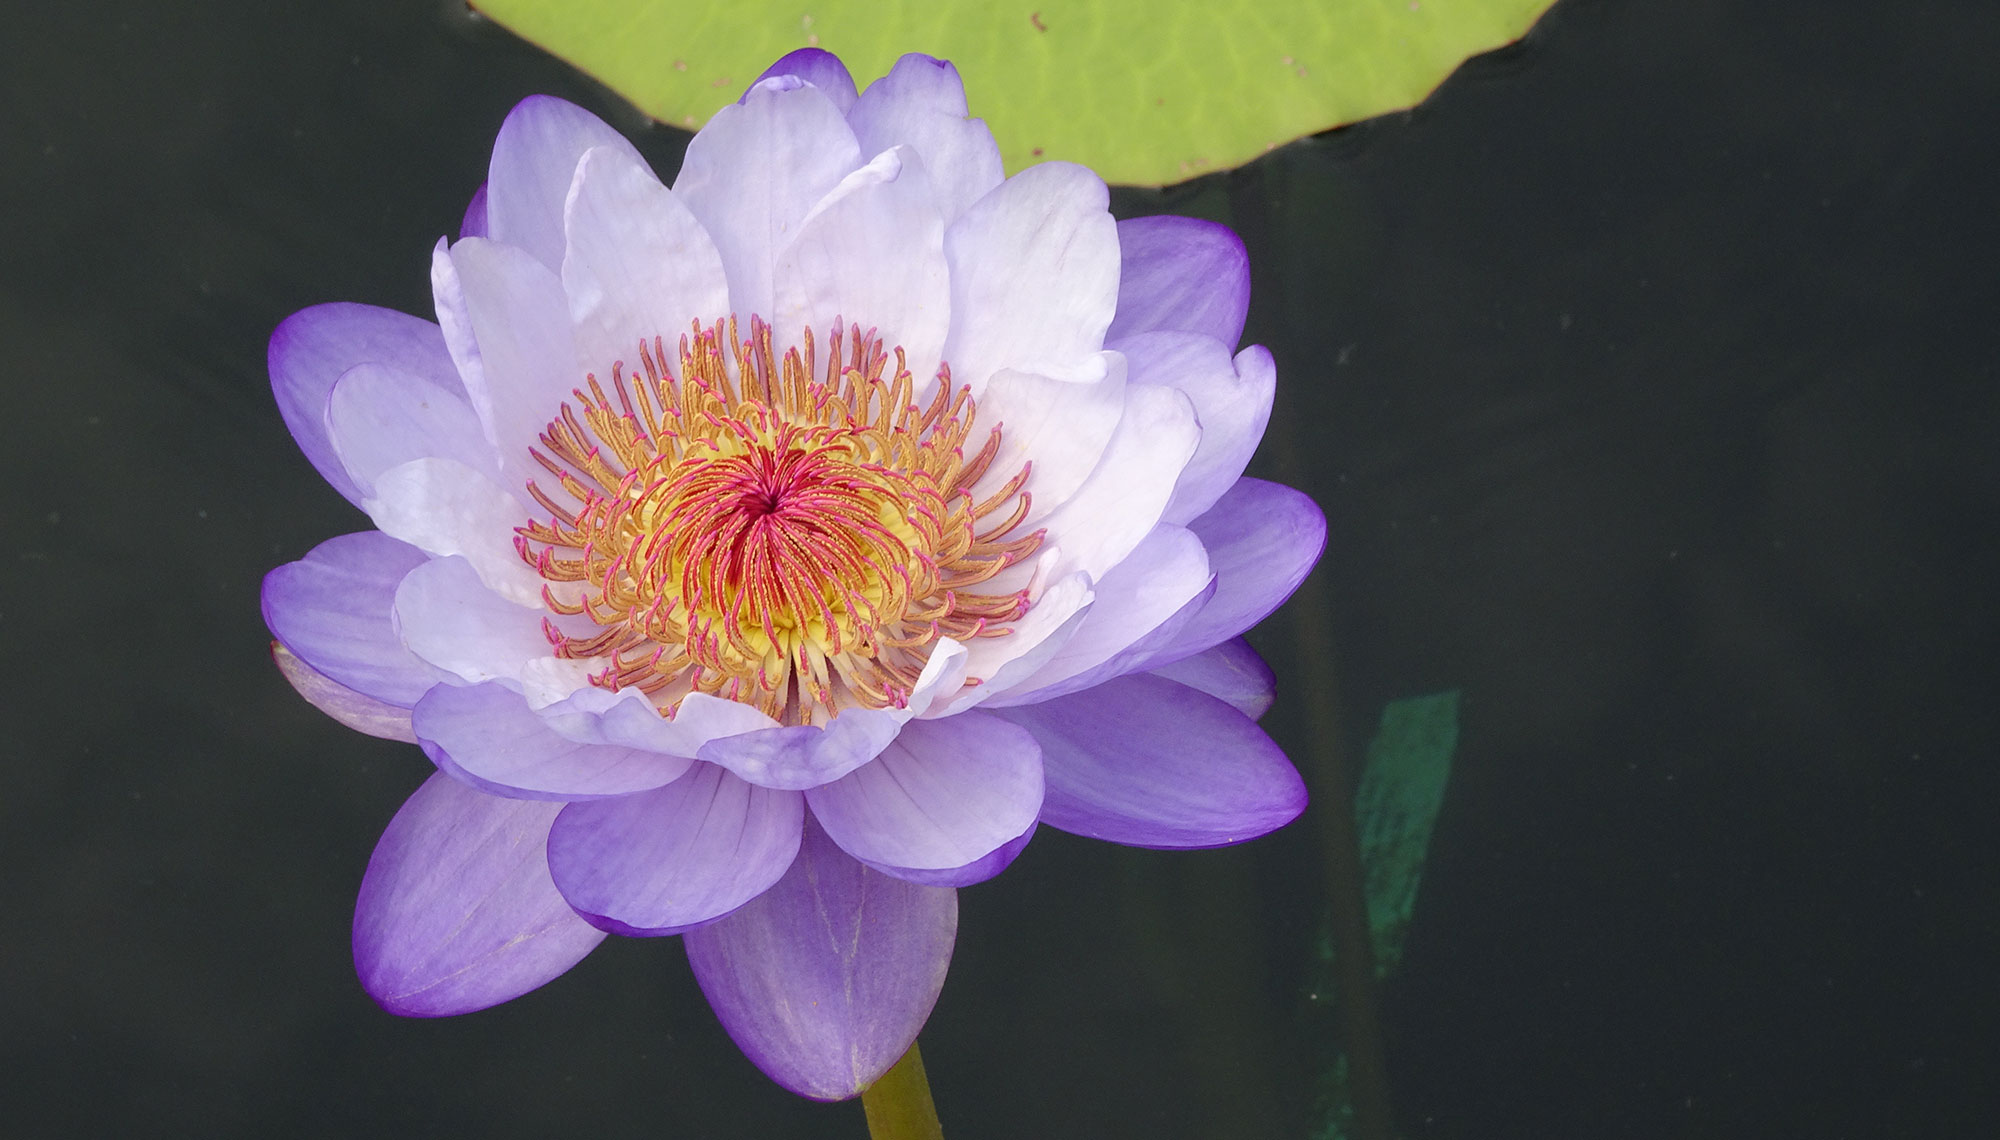 Betty Lou, Rich Sacher, American Aquatic Gardens